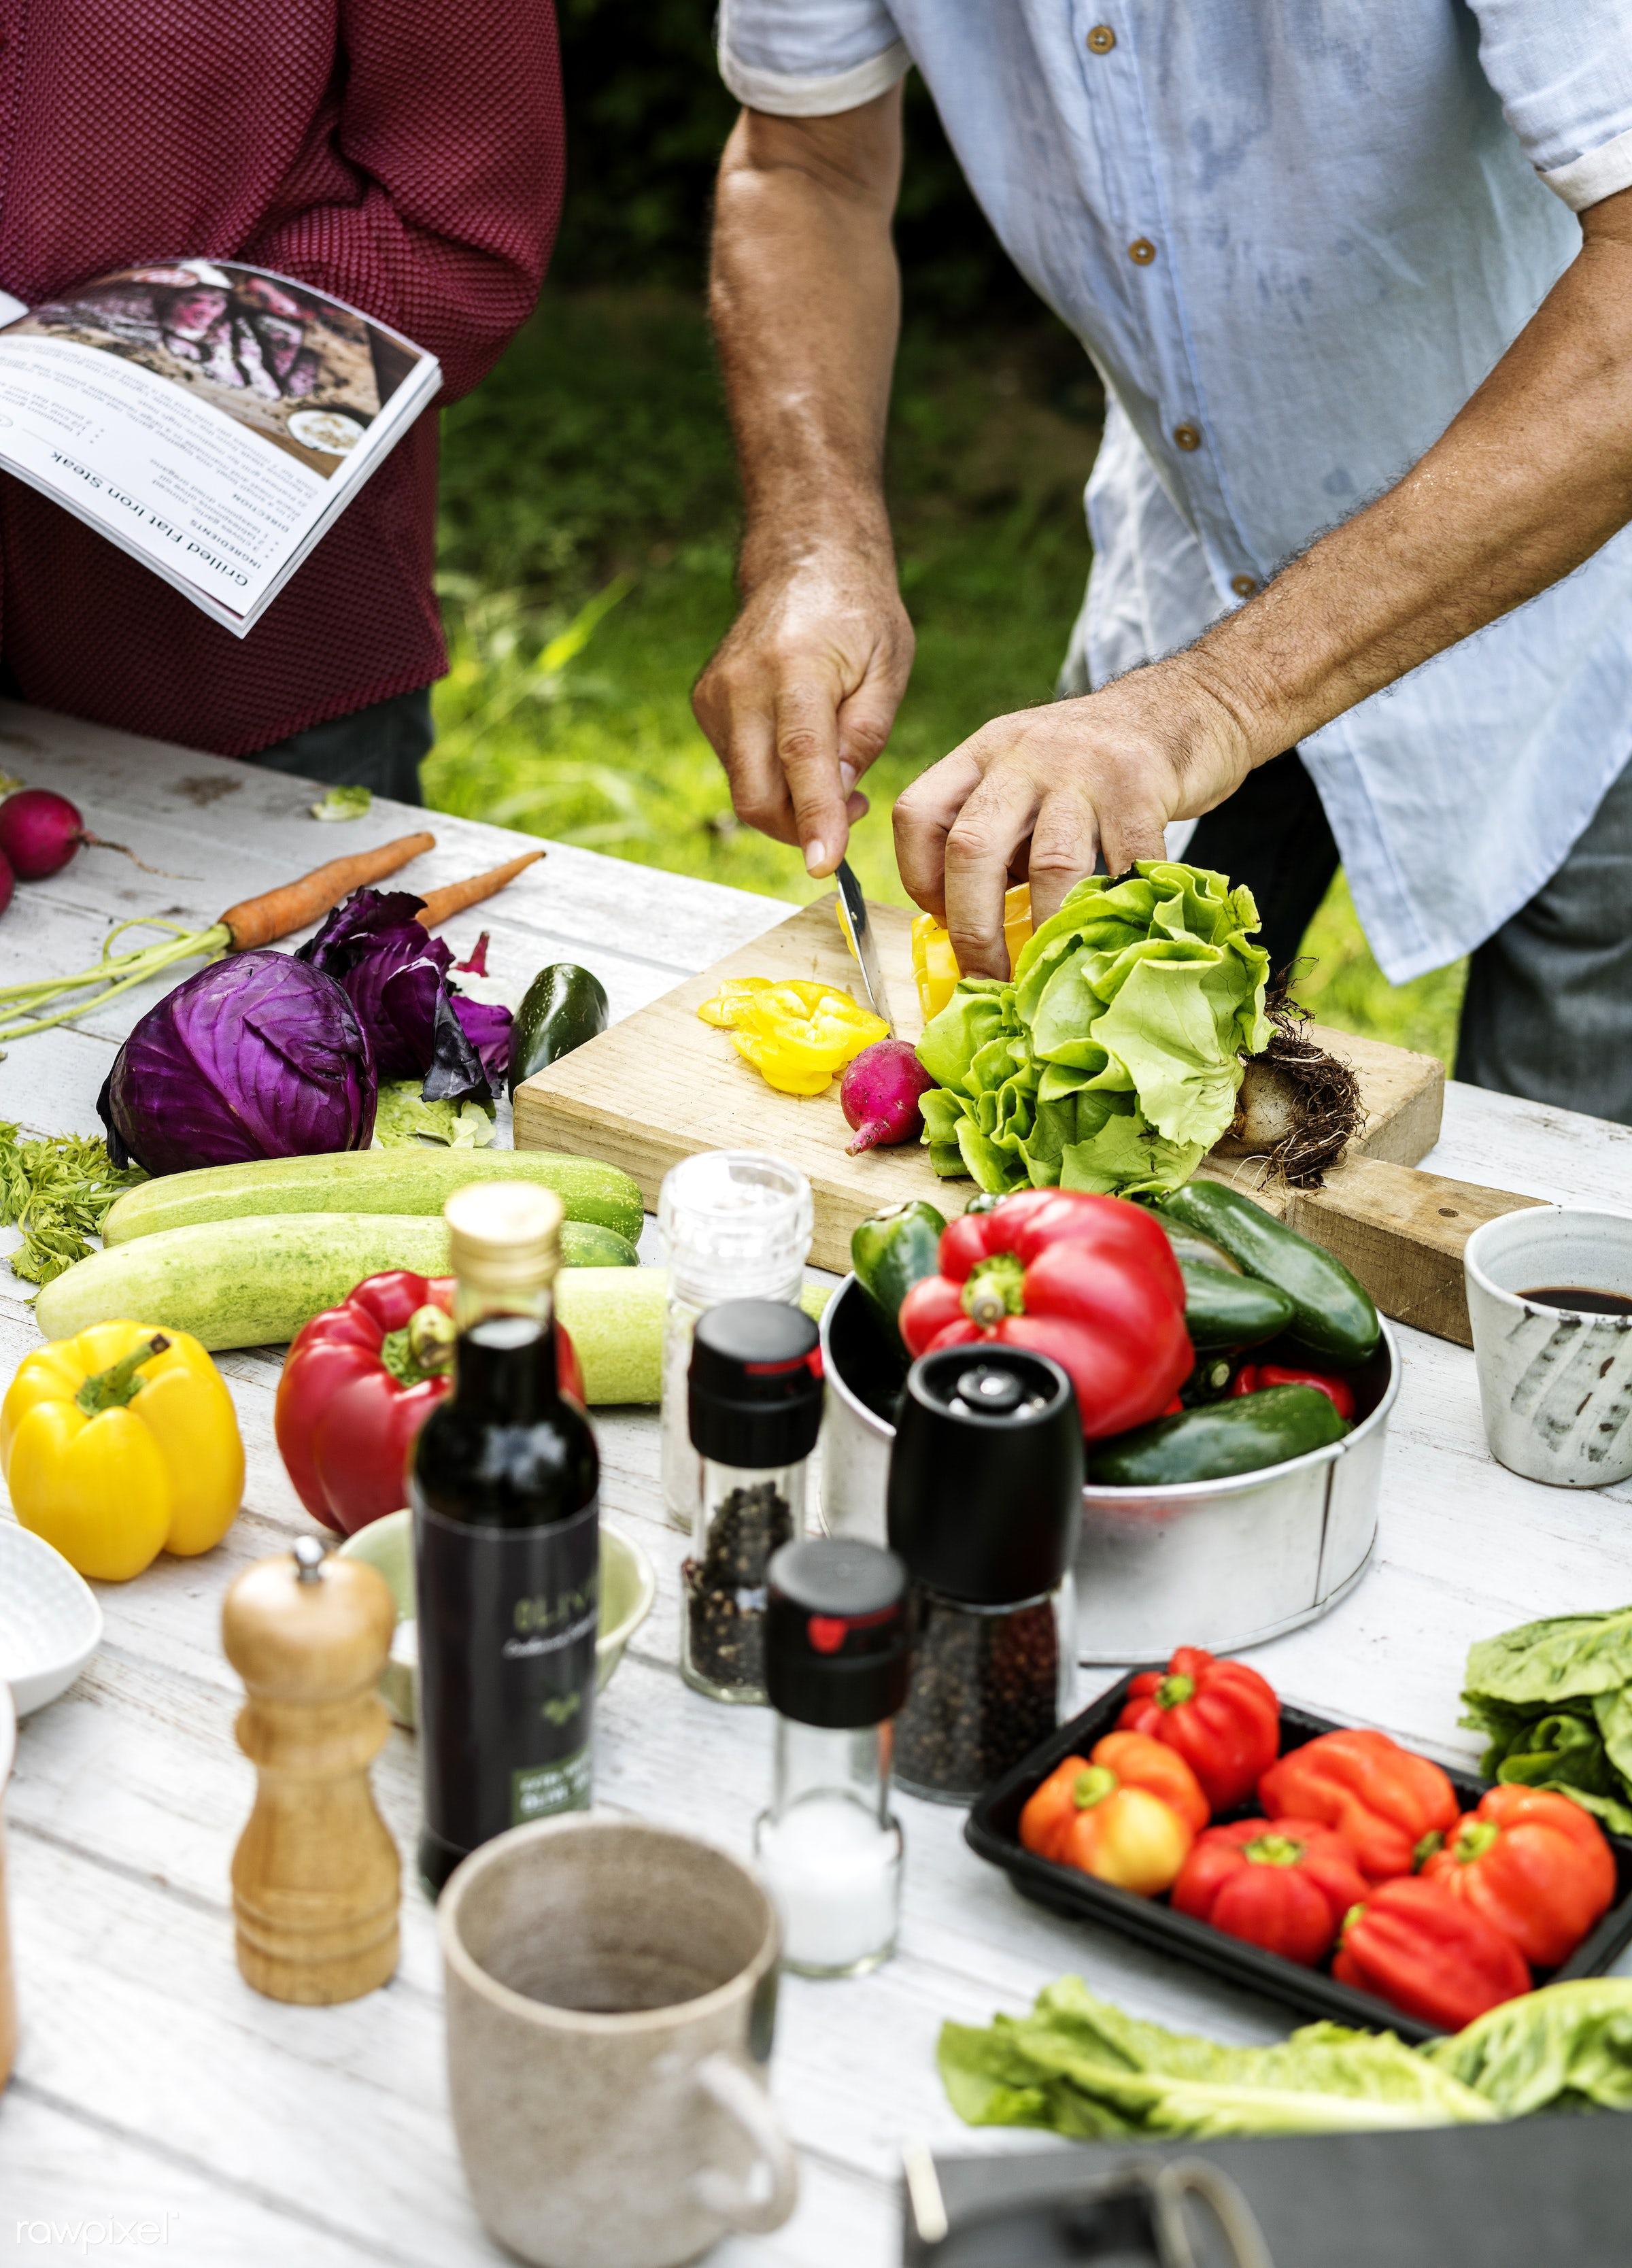 different, salad, recipe, cuisine, homemade, seasoning, fresh, ingredient, cooking, knife, gourmet, meal, cook, preparation...